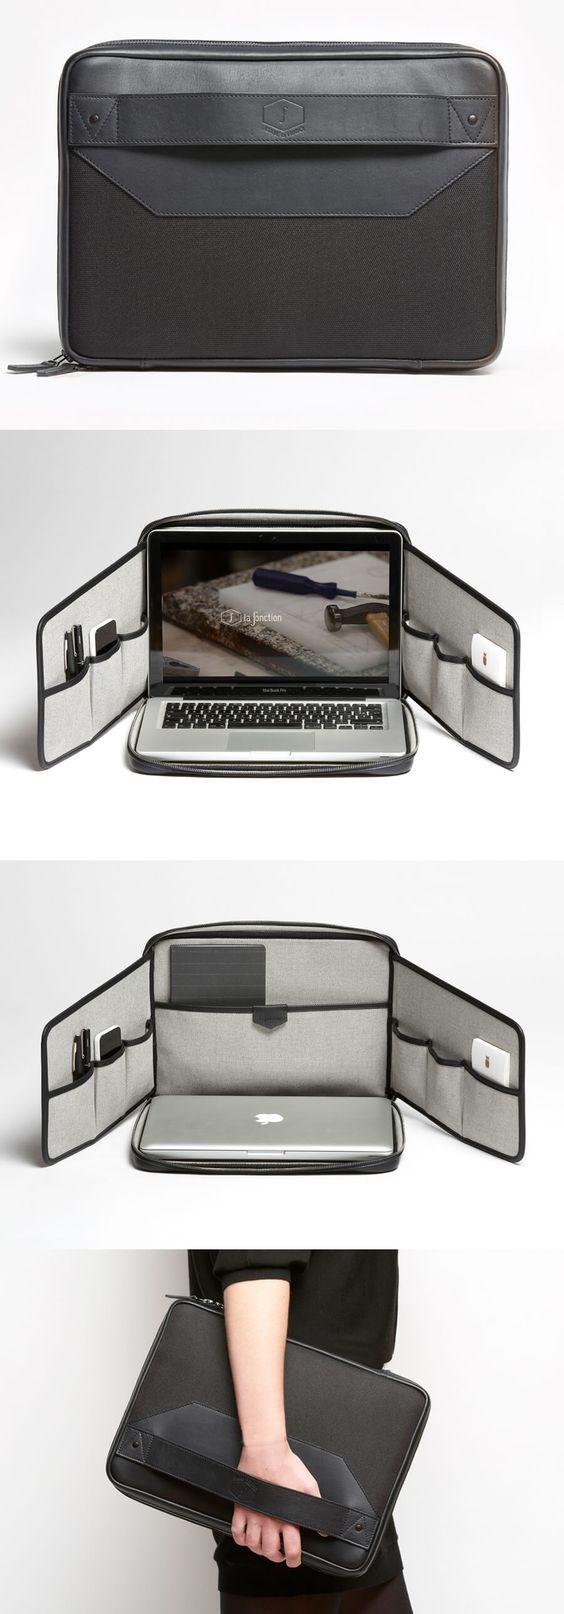 F01.2 (black) laptop bag/stand